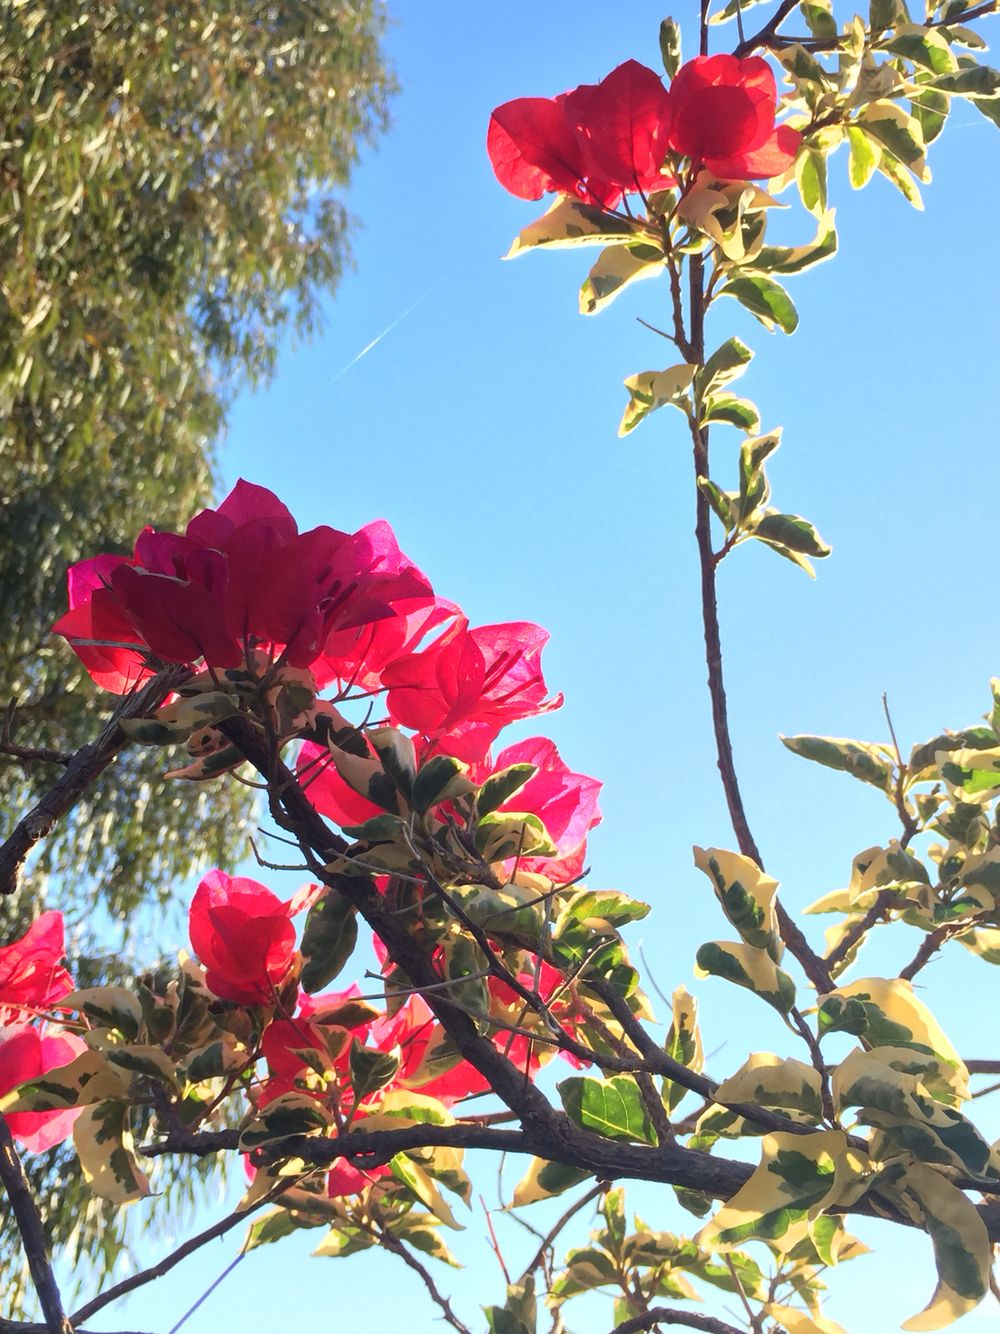 http://www.instagram.com/fannybdn/ #flowers #melbourne #garden #australie #trees #pink